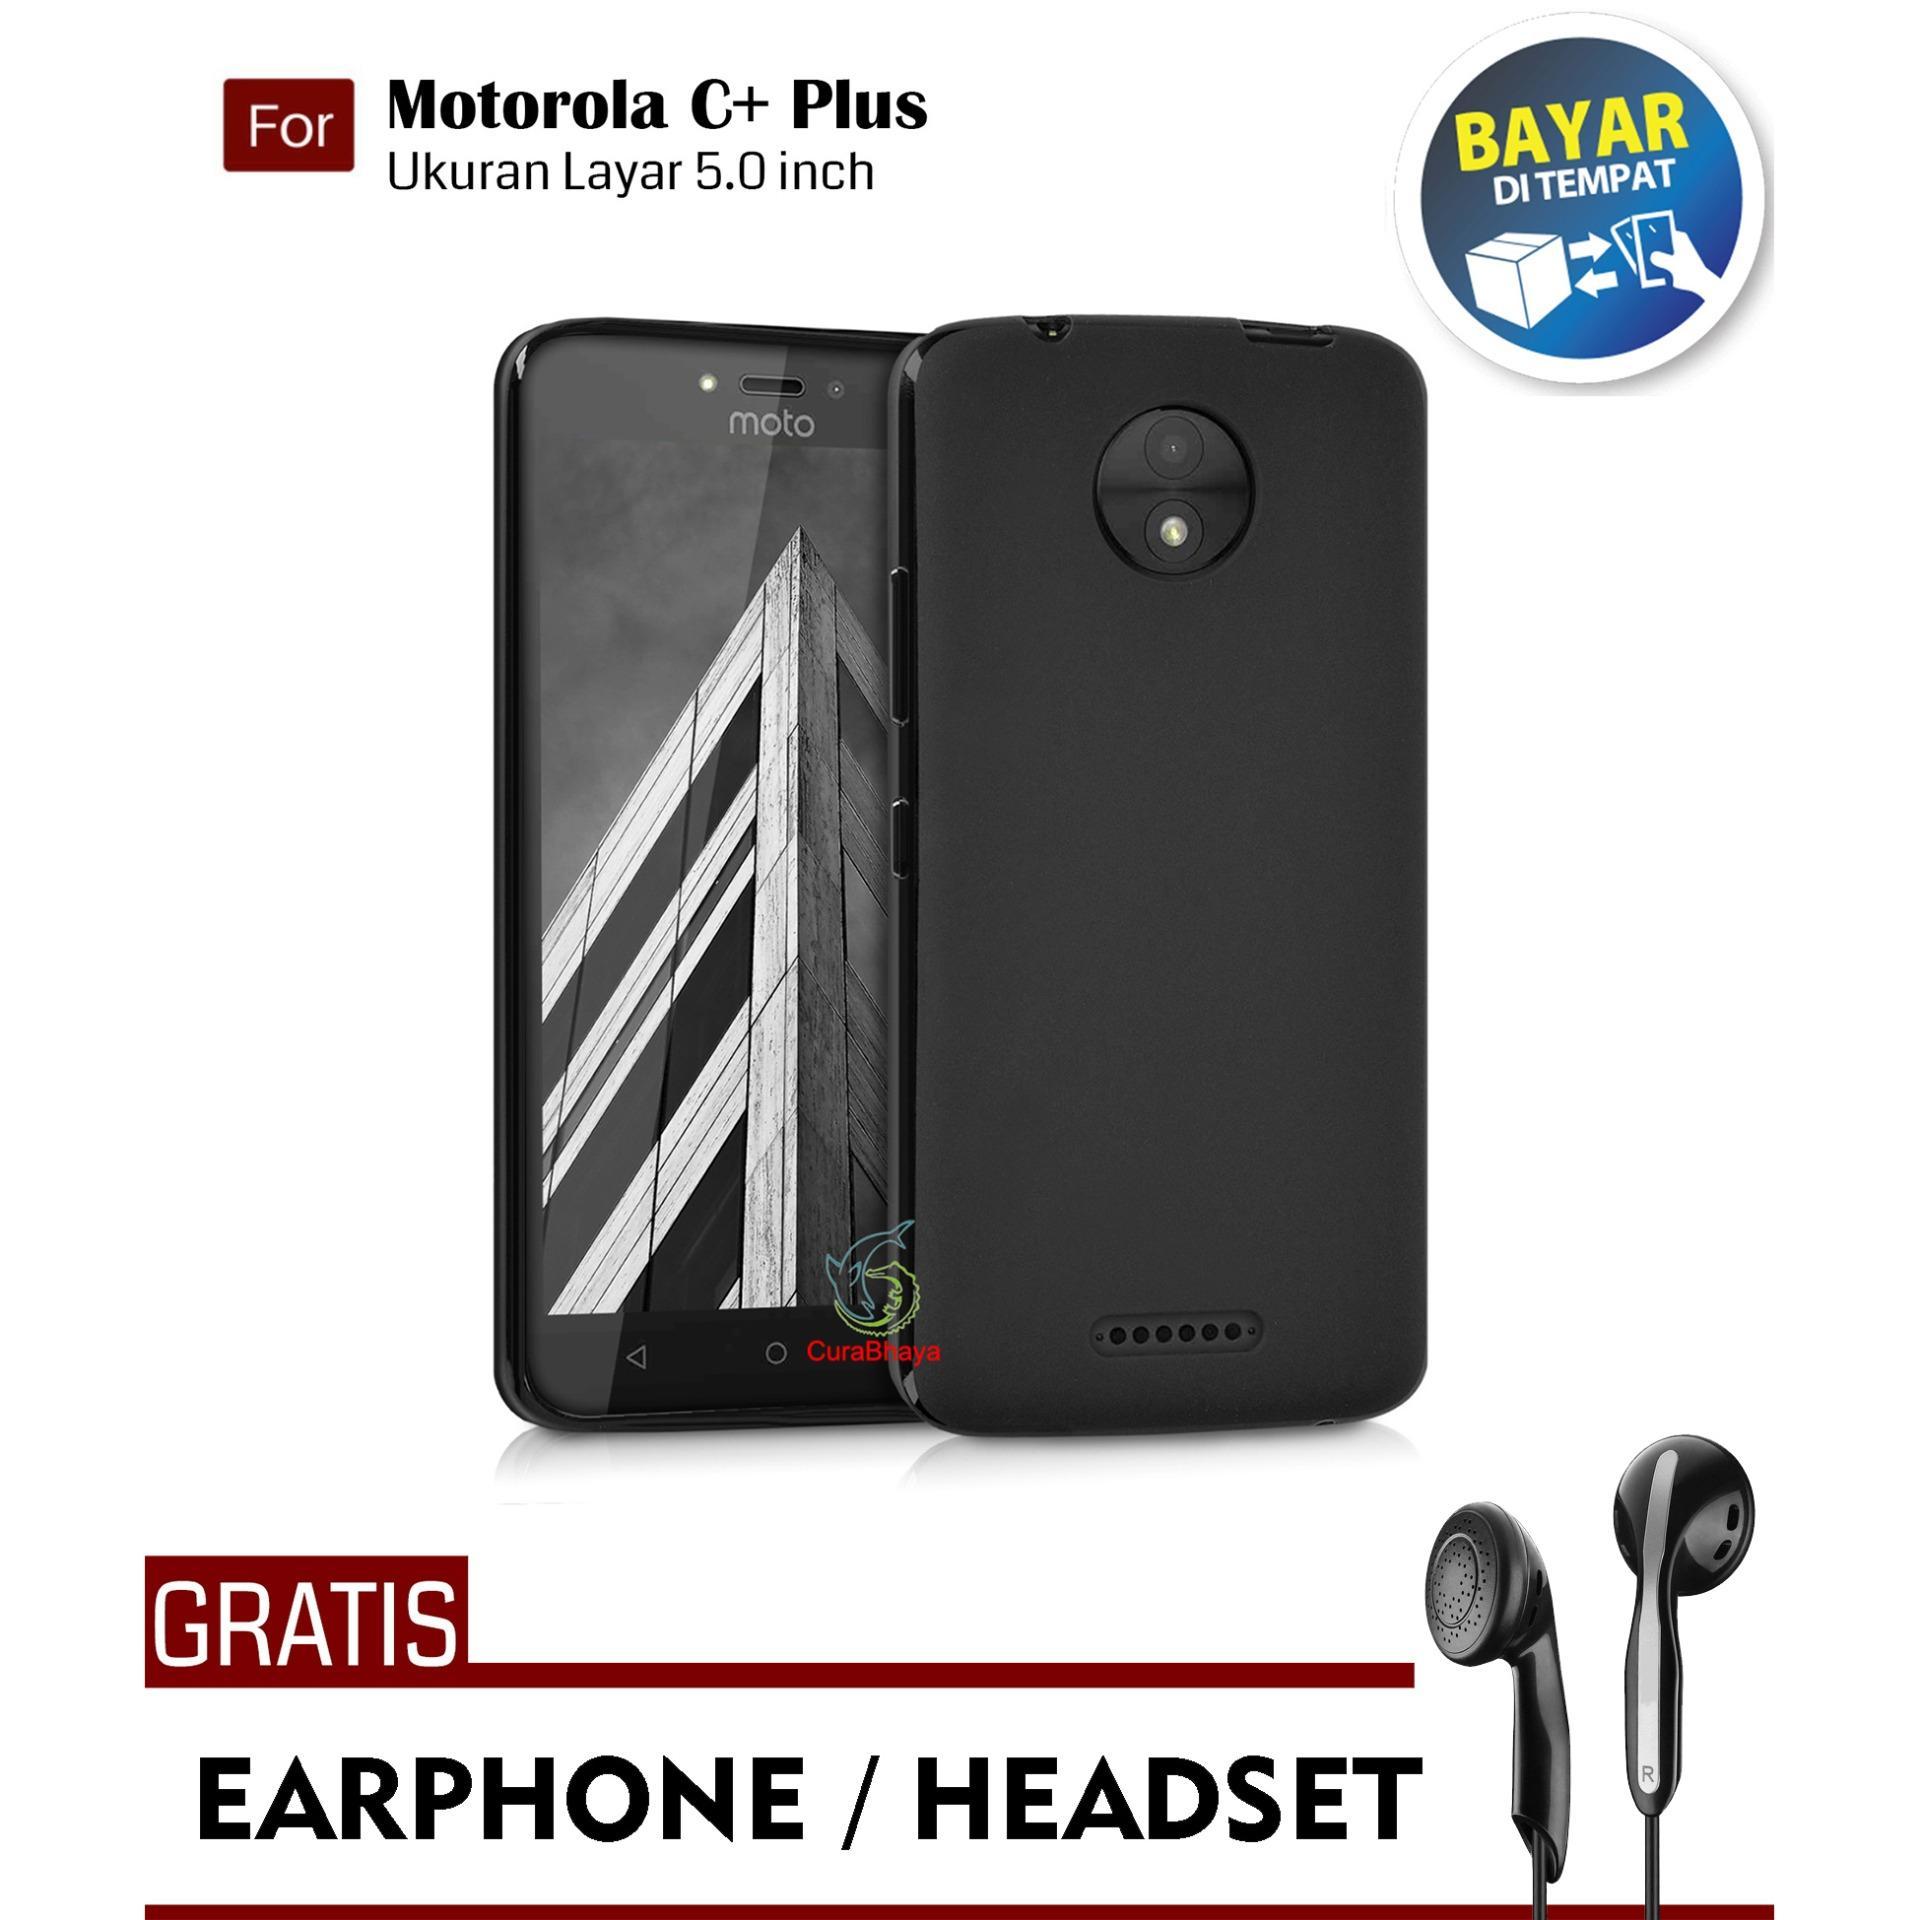 Midnight Motorola Moto C+ Plus | Slim Case Black Matte Softcase Premium Baby Skin + Gratis